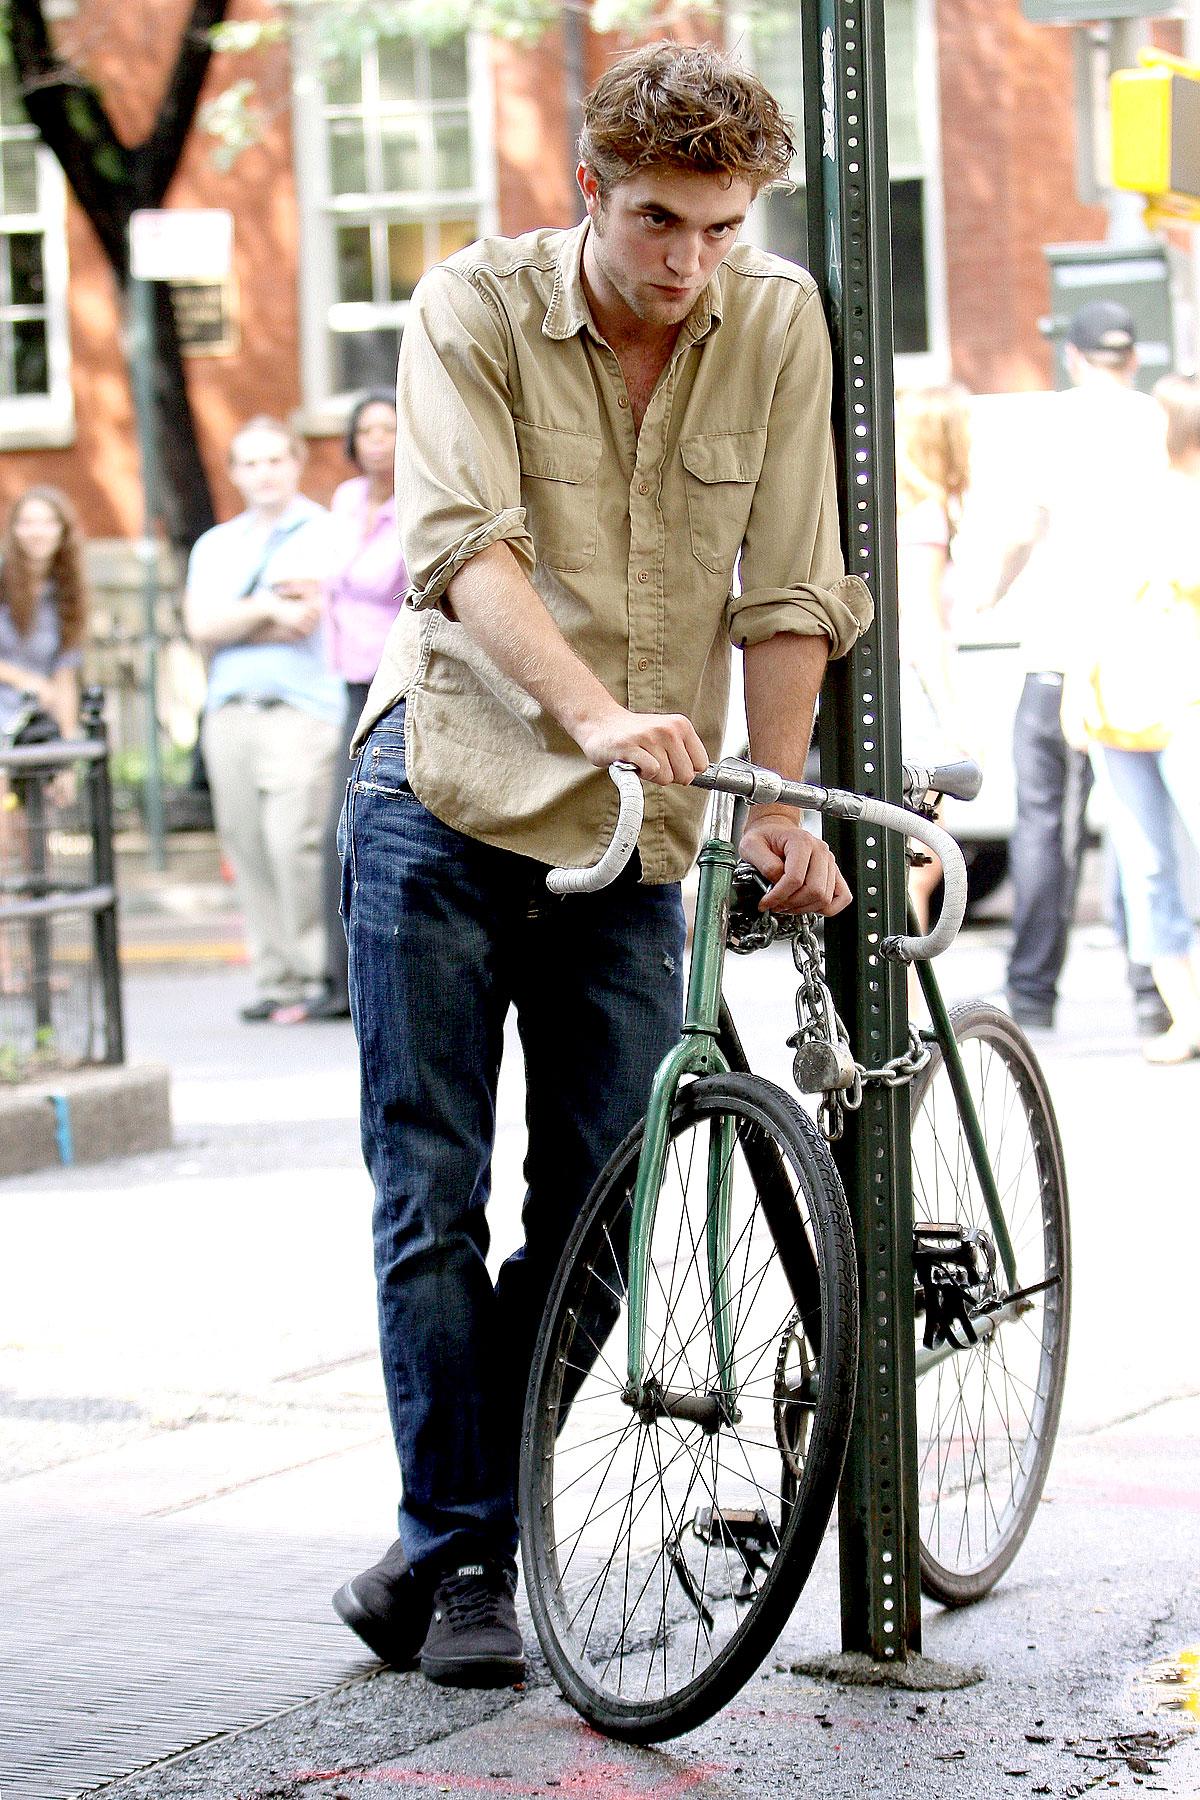 PHOTO GALLERY: Robert Pattinson Looks Sad